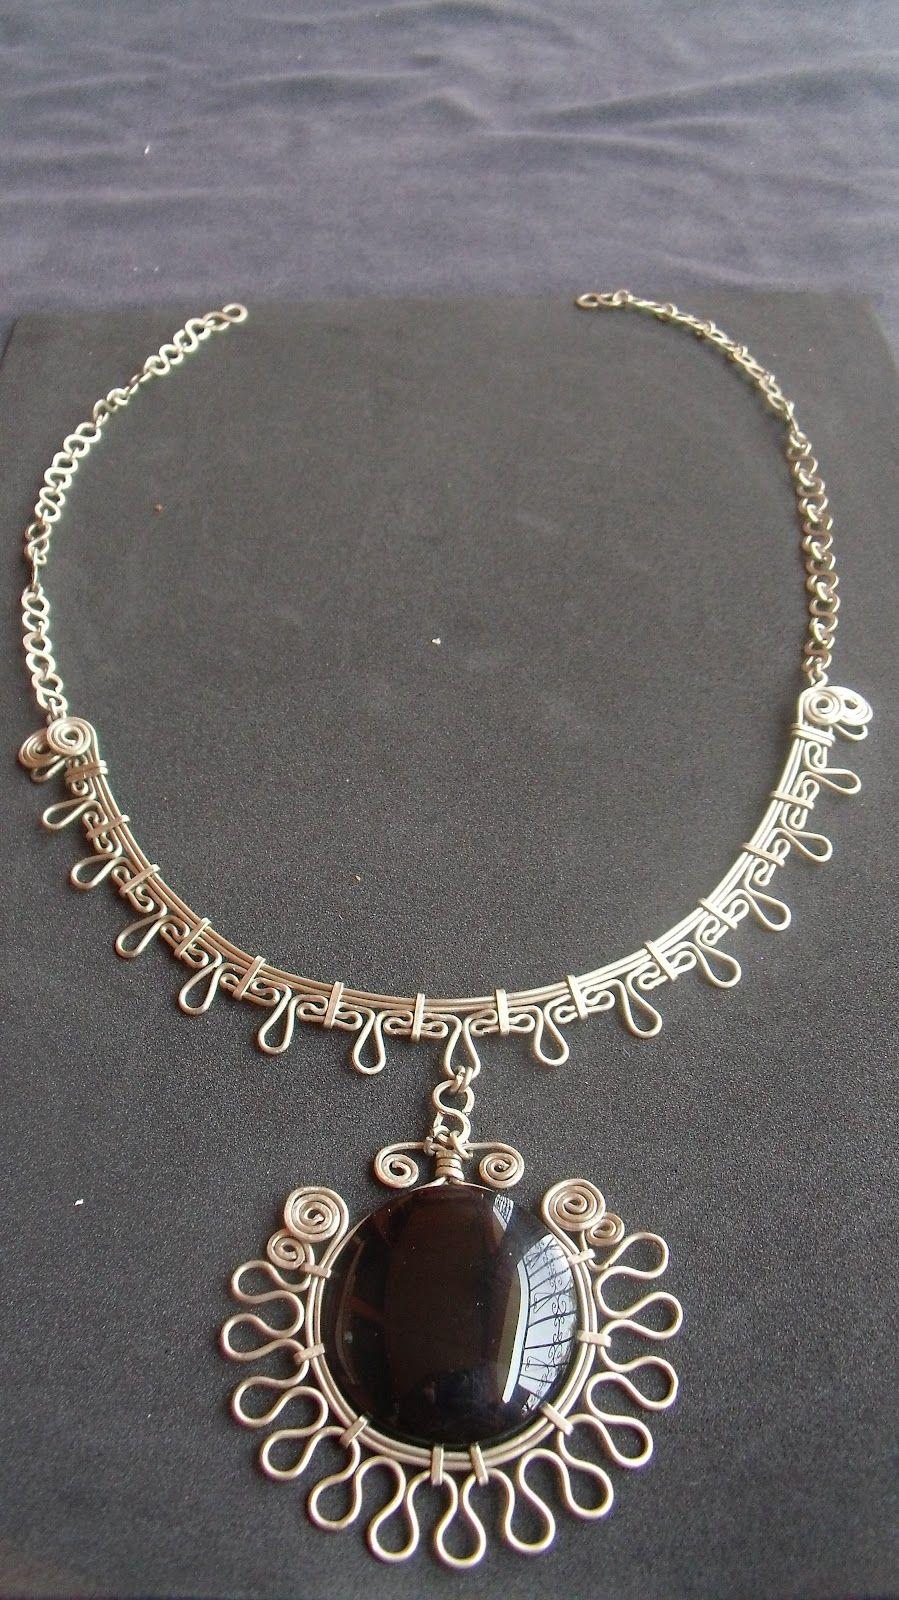 GEDC1397.JPG (899×1600) | Handmade jewelry | Pinterest | Wire ...